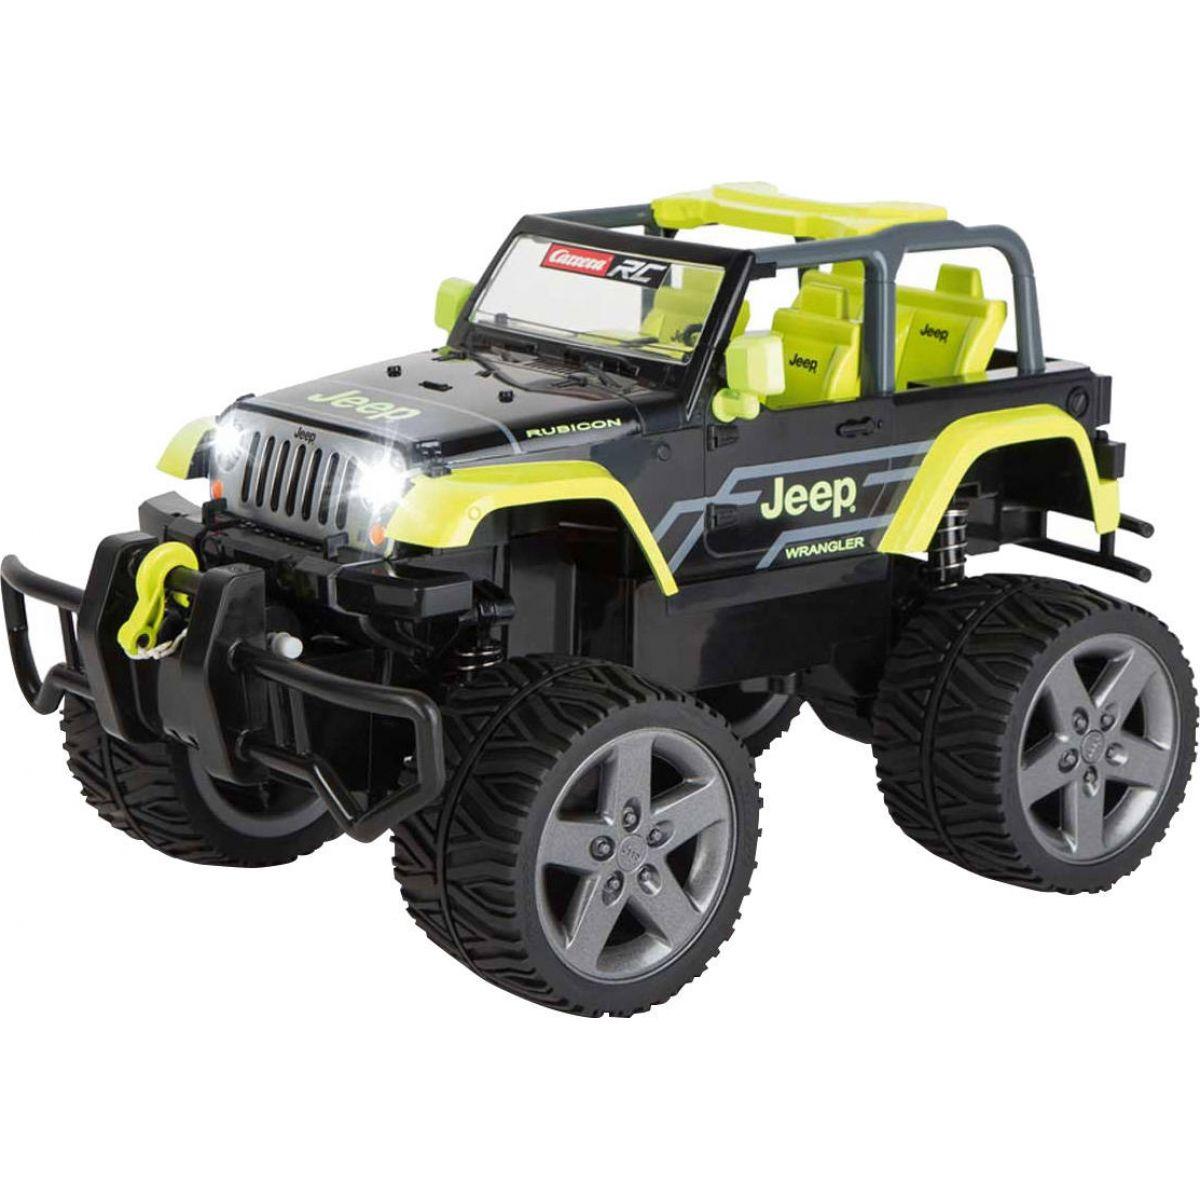 Carrera RC auto Jeep Wrangler 1:16